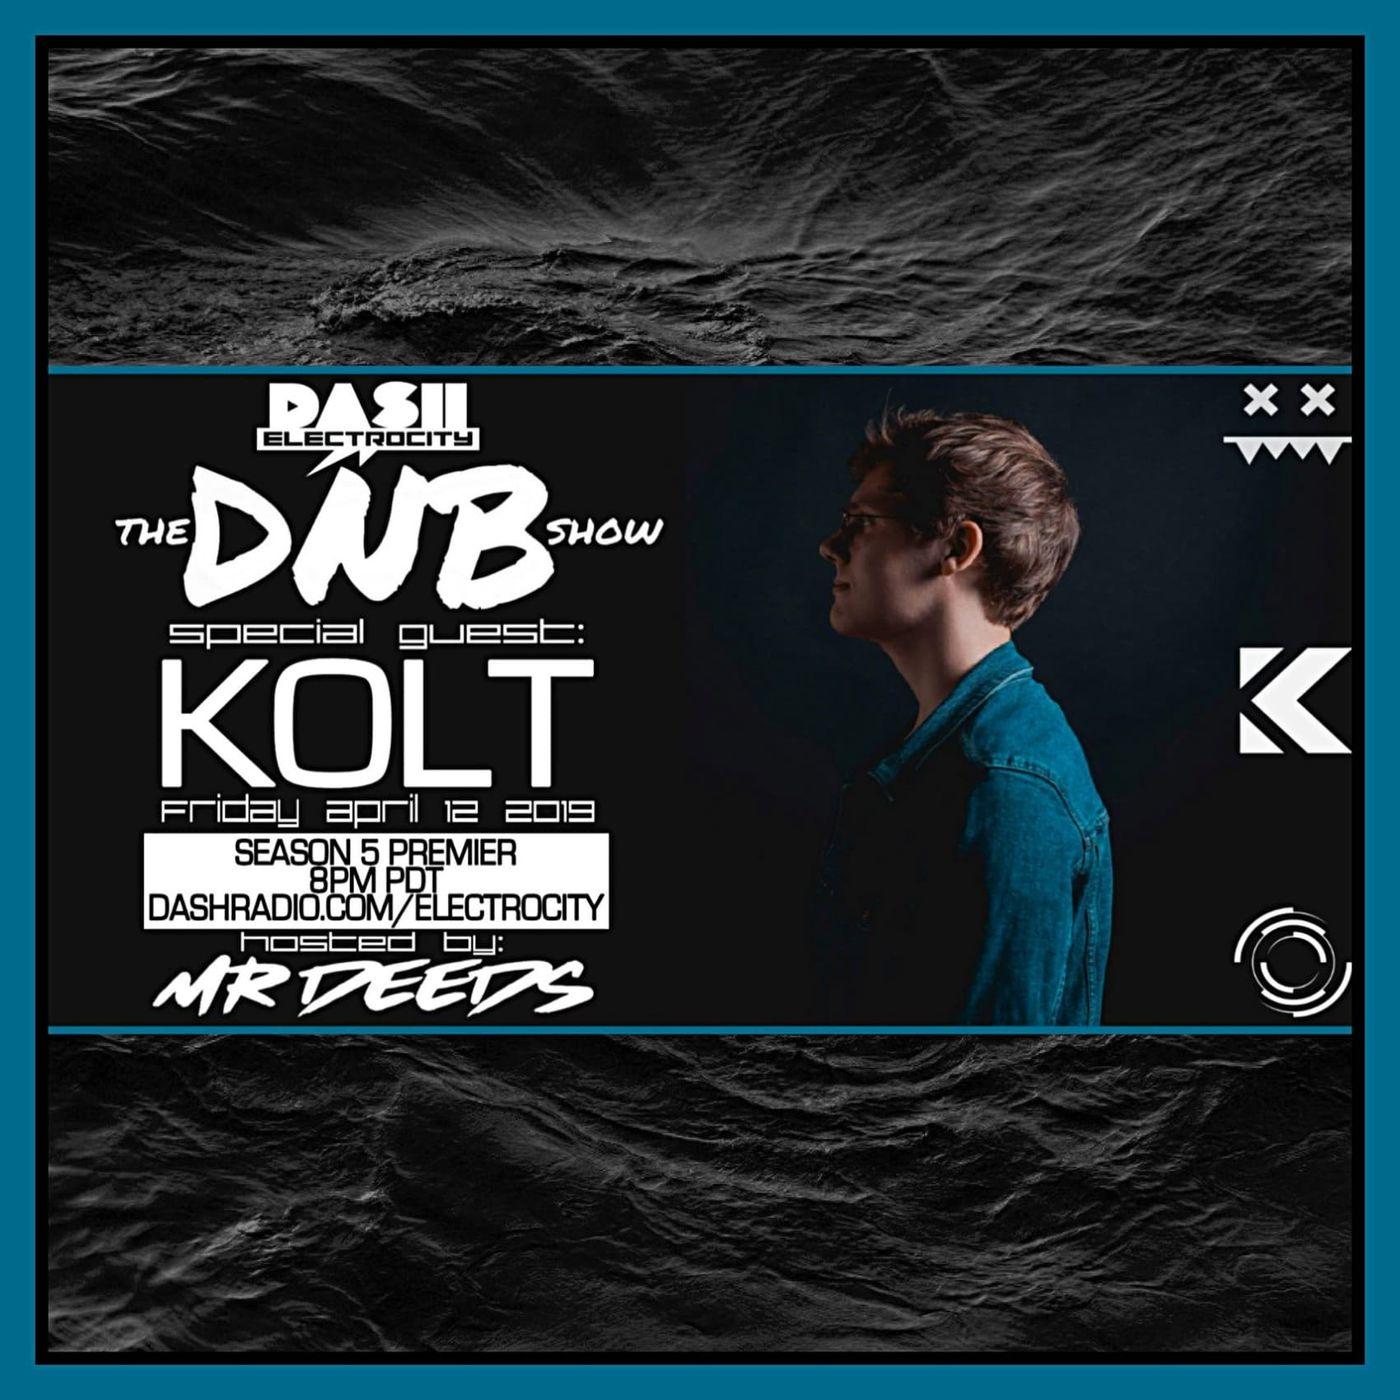 the DNB show Episode 43 (guest mix Kolt)